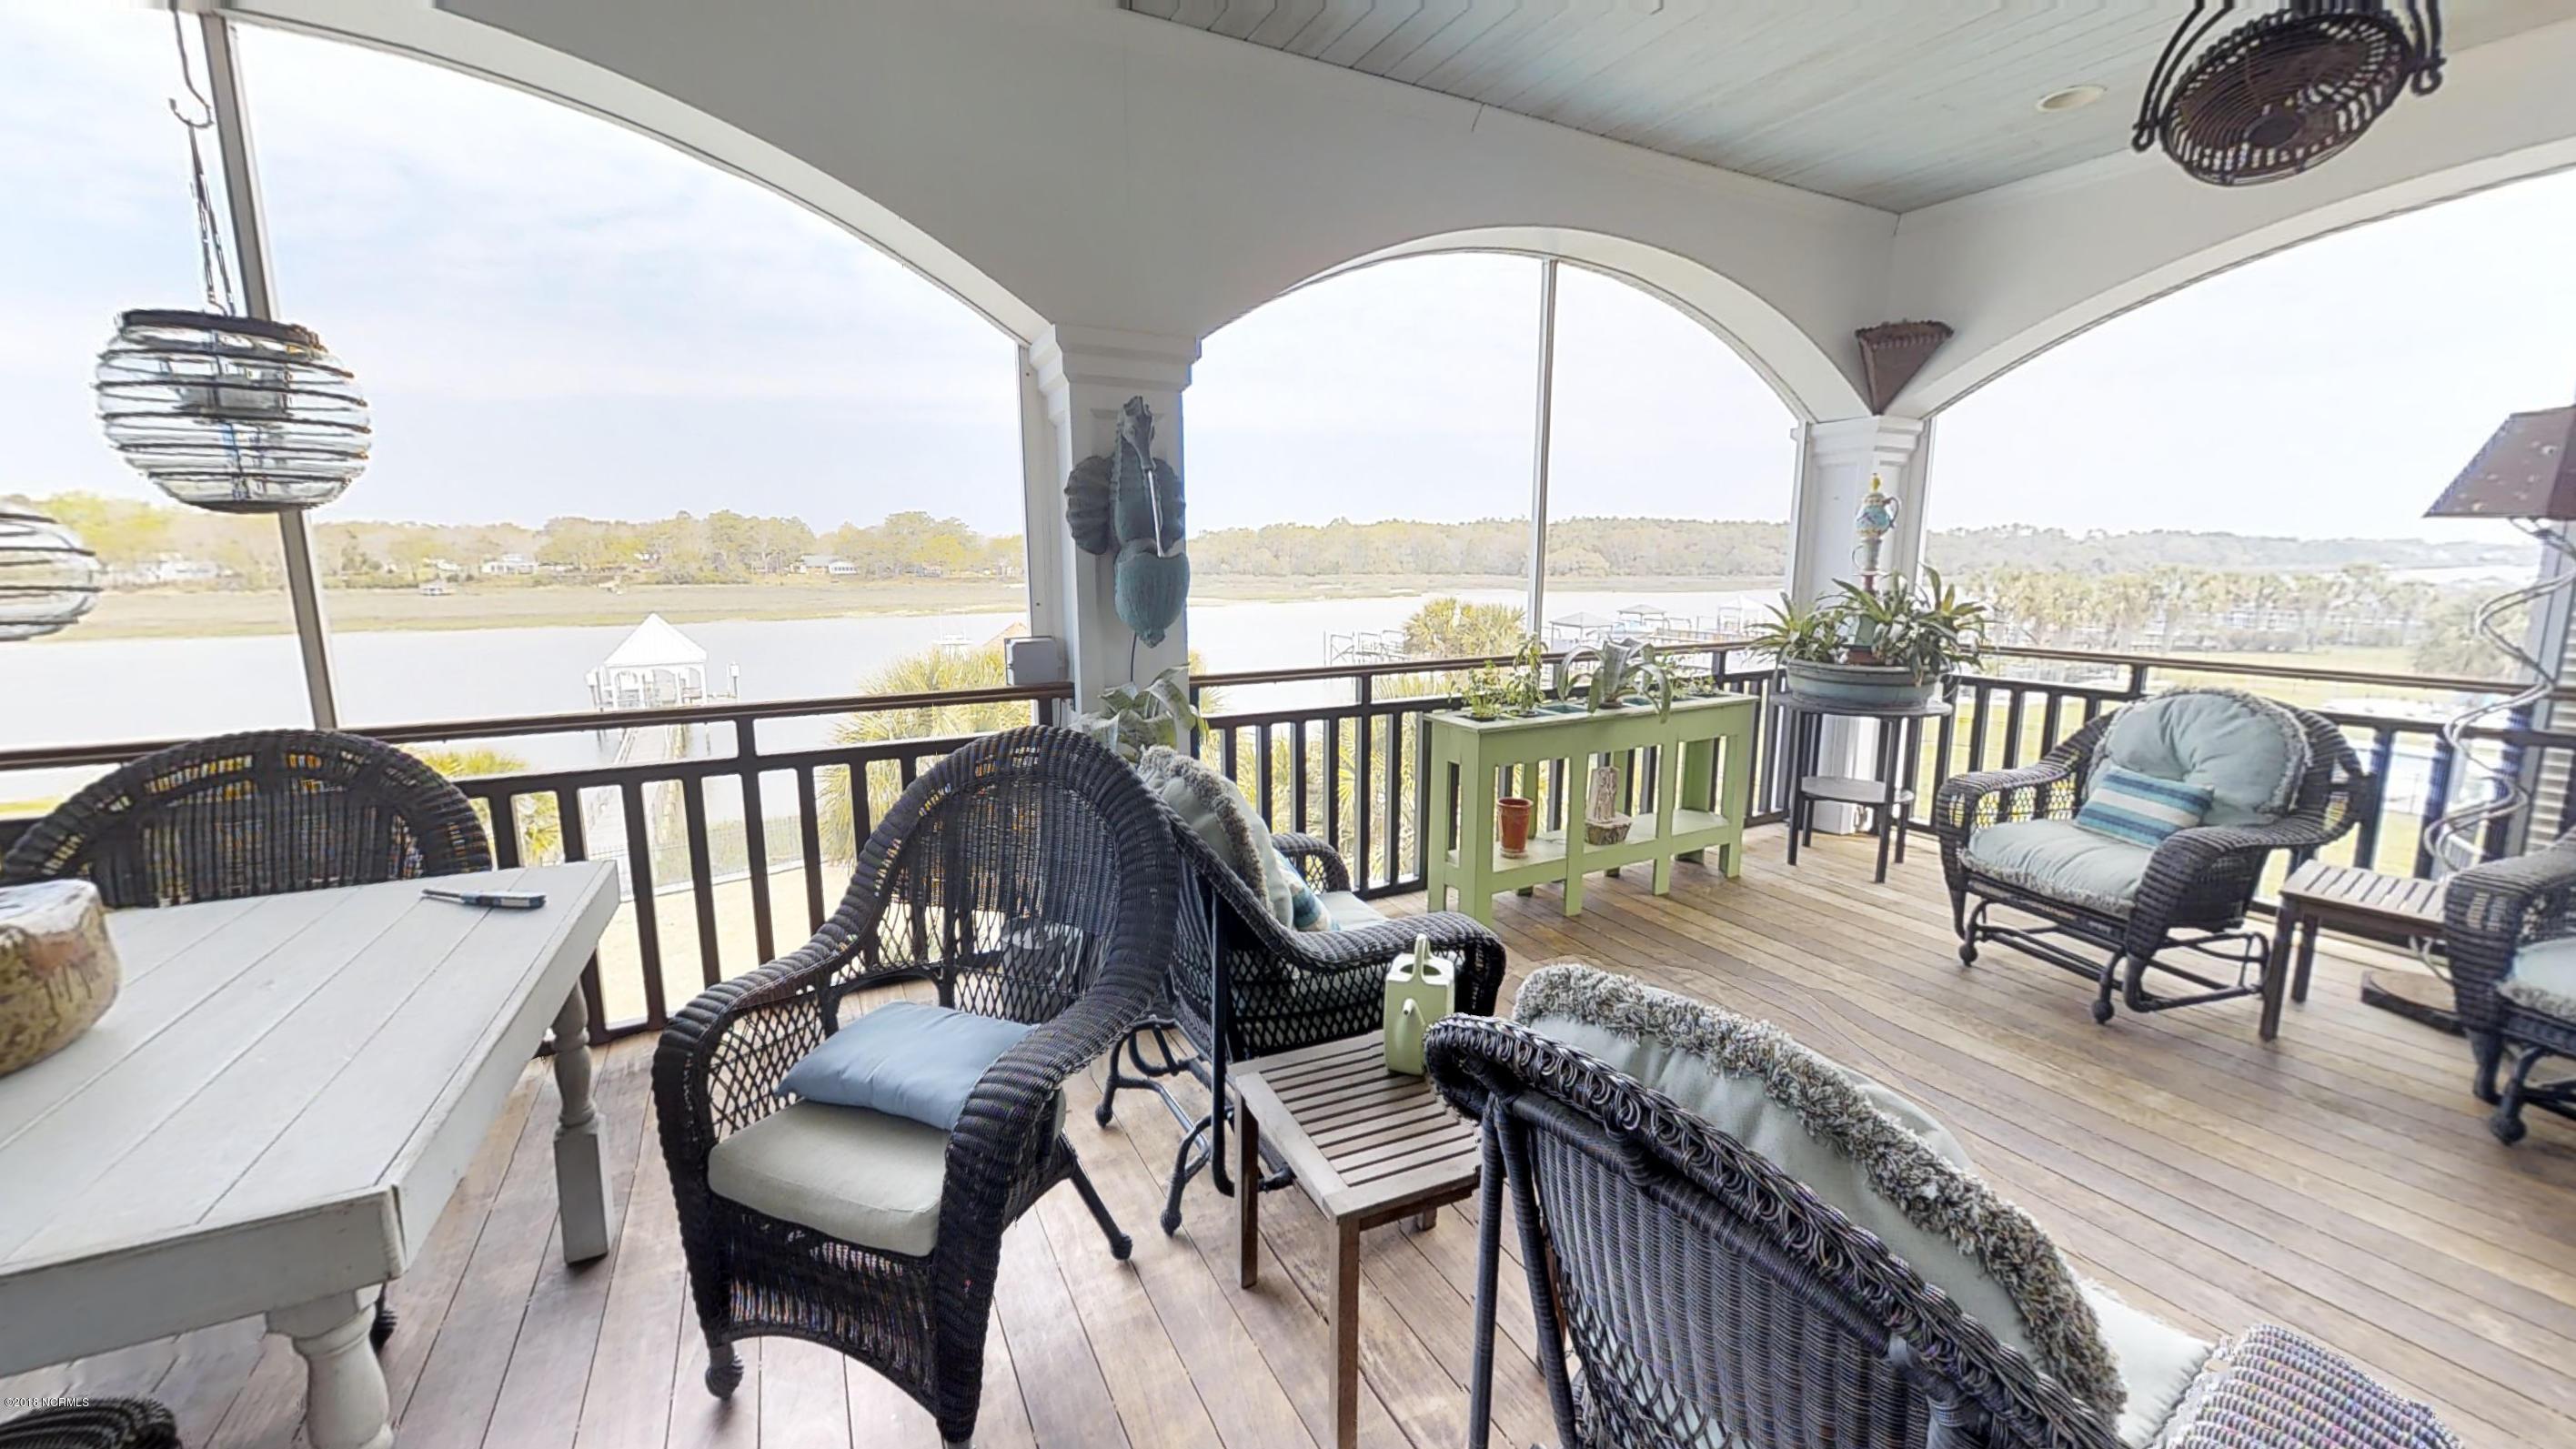 Ocean Isle Beach Real Estate - http://cdn.resize.sparkplatform.com/ncr/1024x768/true/20180414120143524599000000-o.jpg